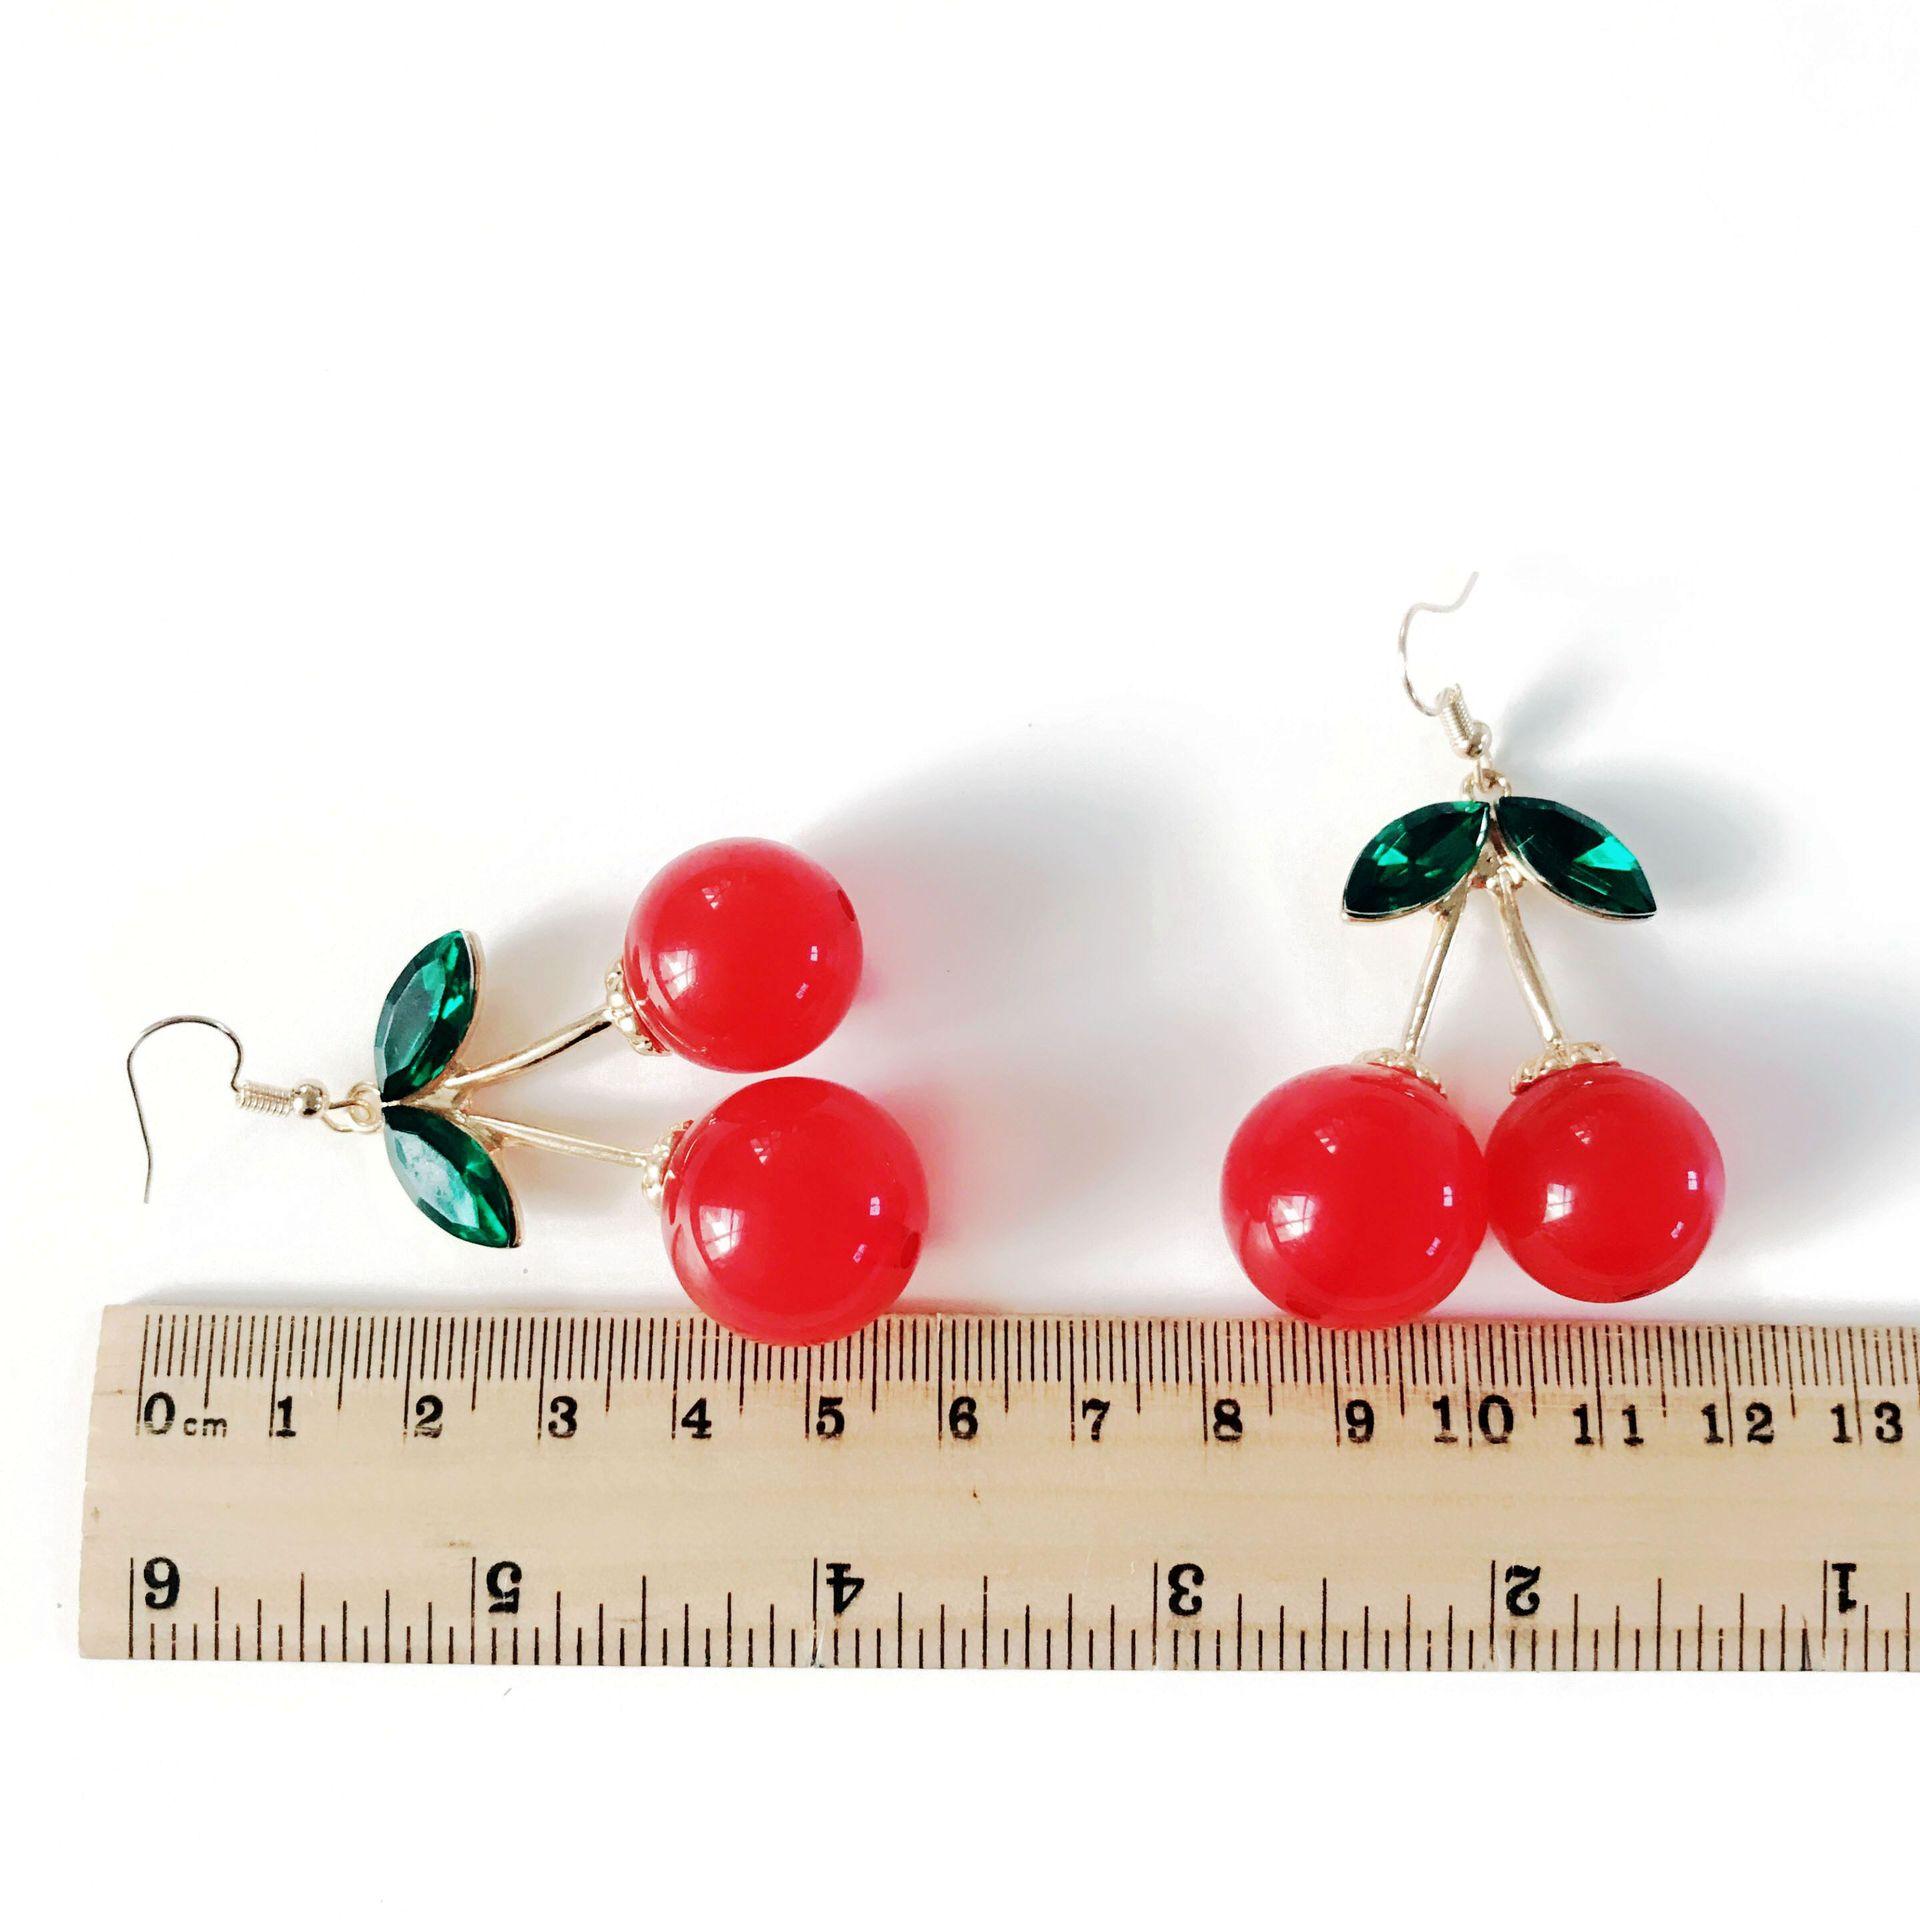 Alloy Fashion Geometric earring  (Photo Color) NHOM0816-Photo-Color